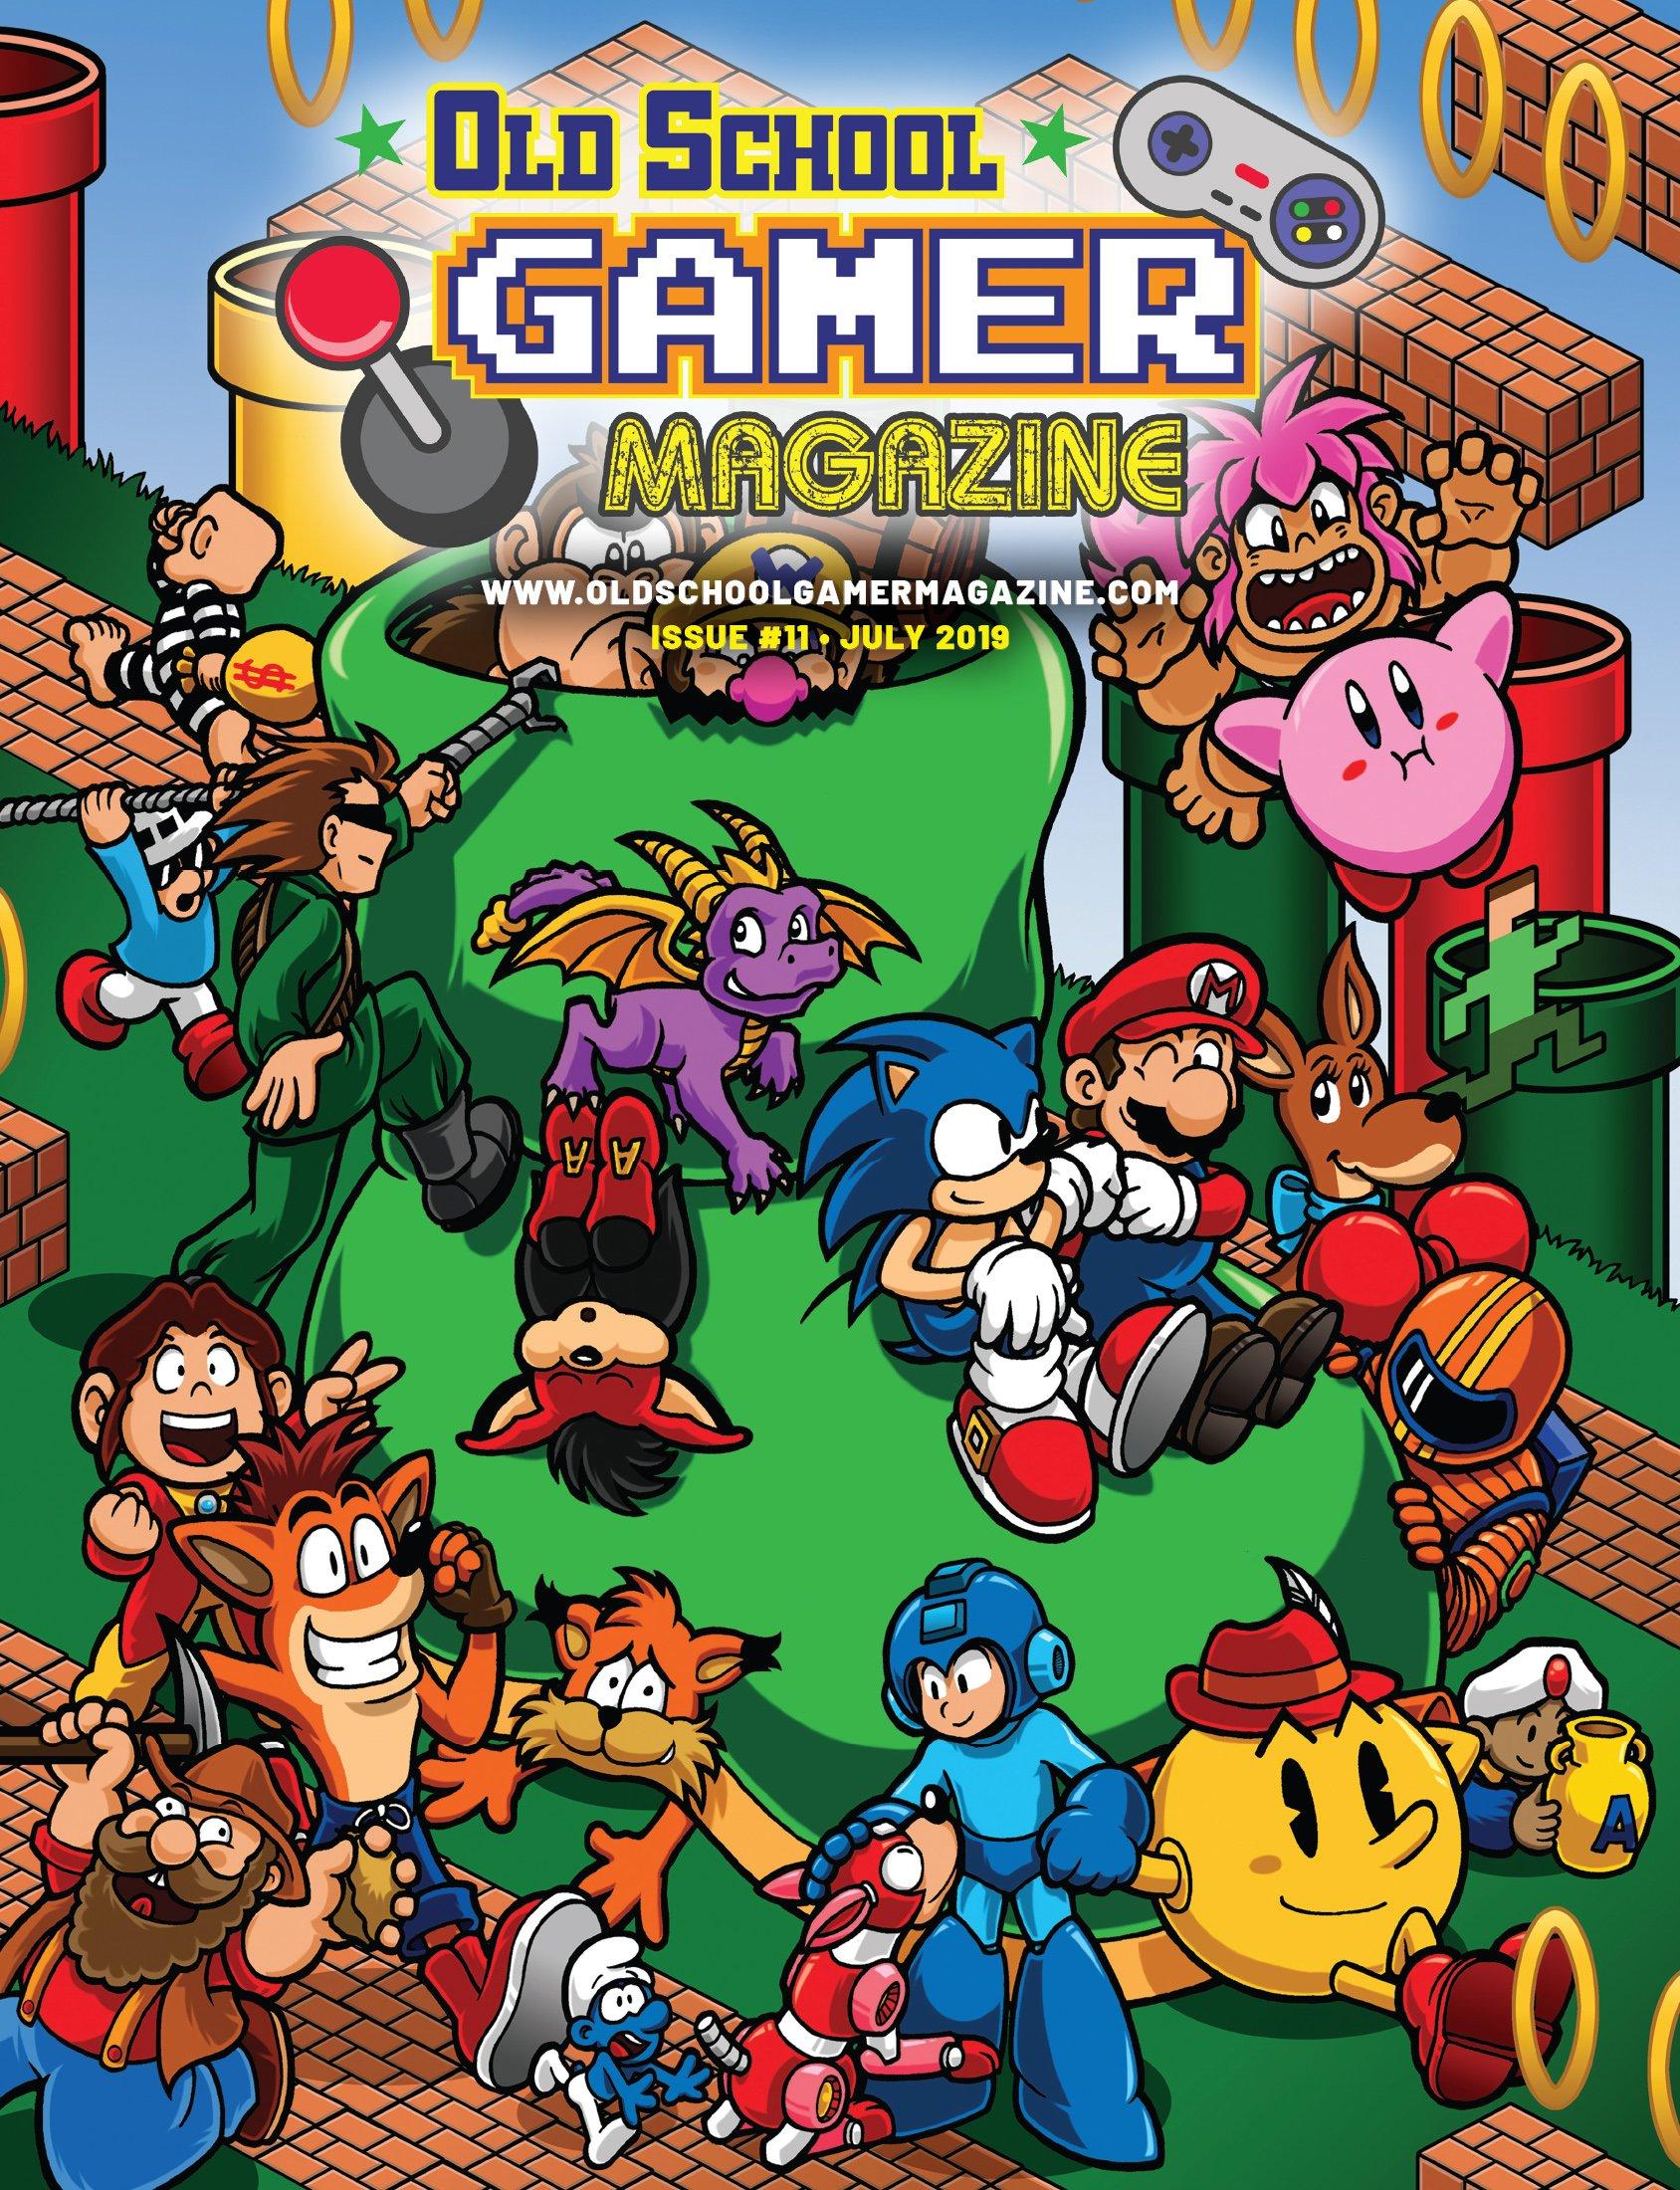 Old School Gamer Magazine Issue 11 July 2019